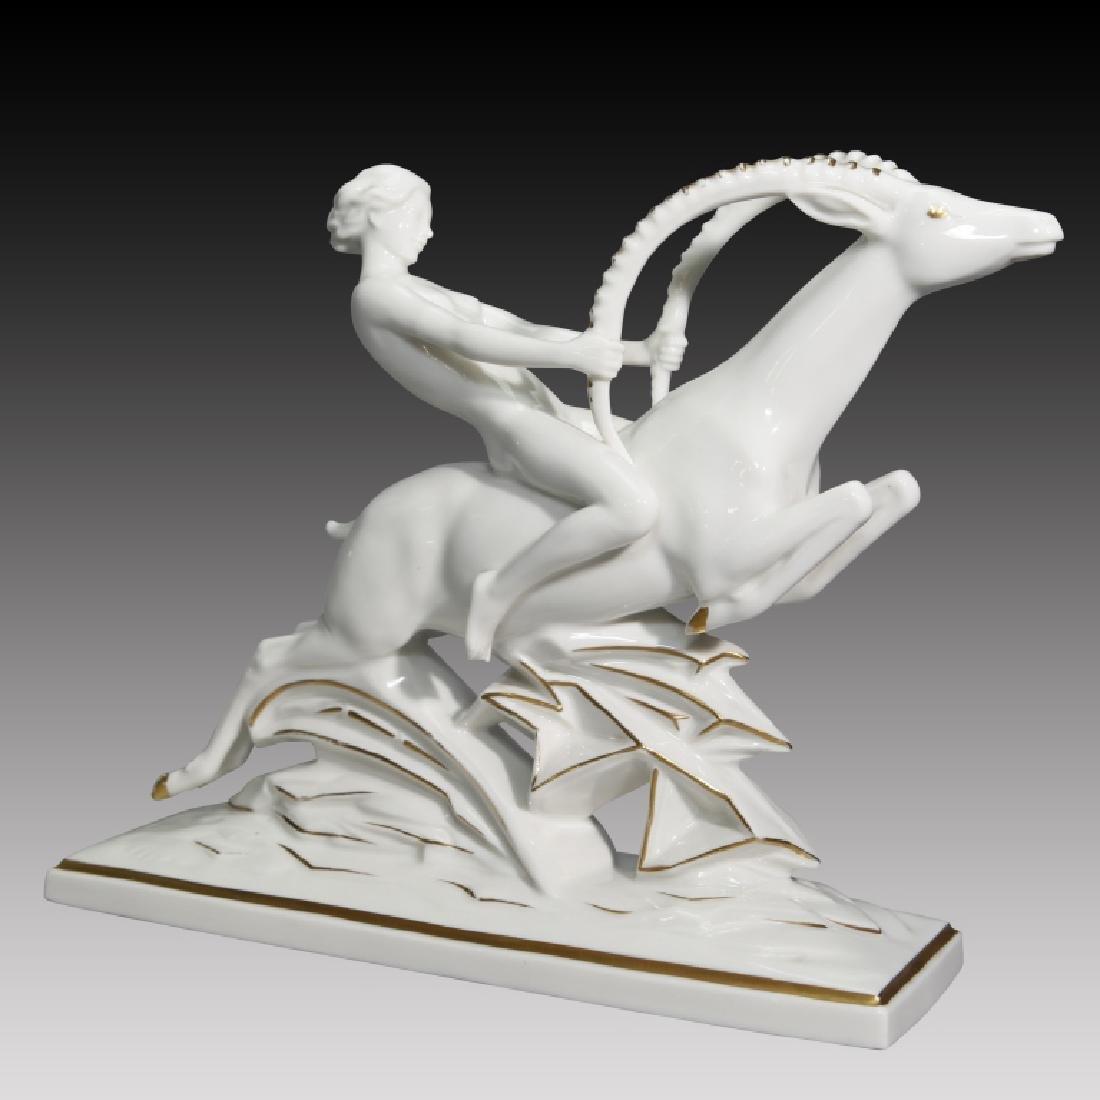 Hutschenreuther Art Deco Nude Woman Riding Gazelle